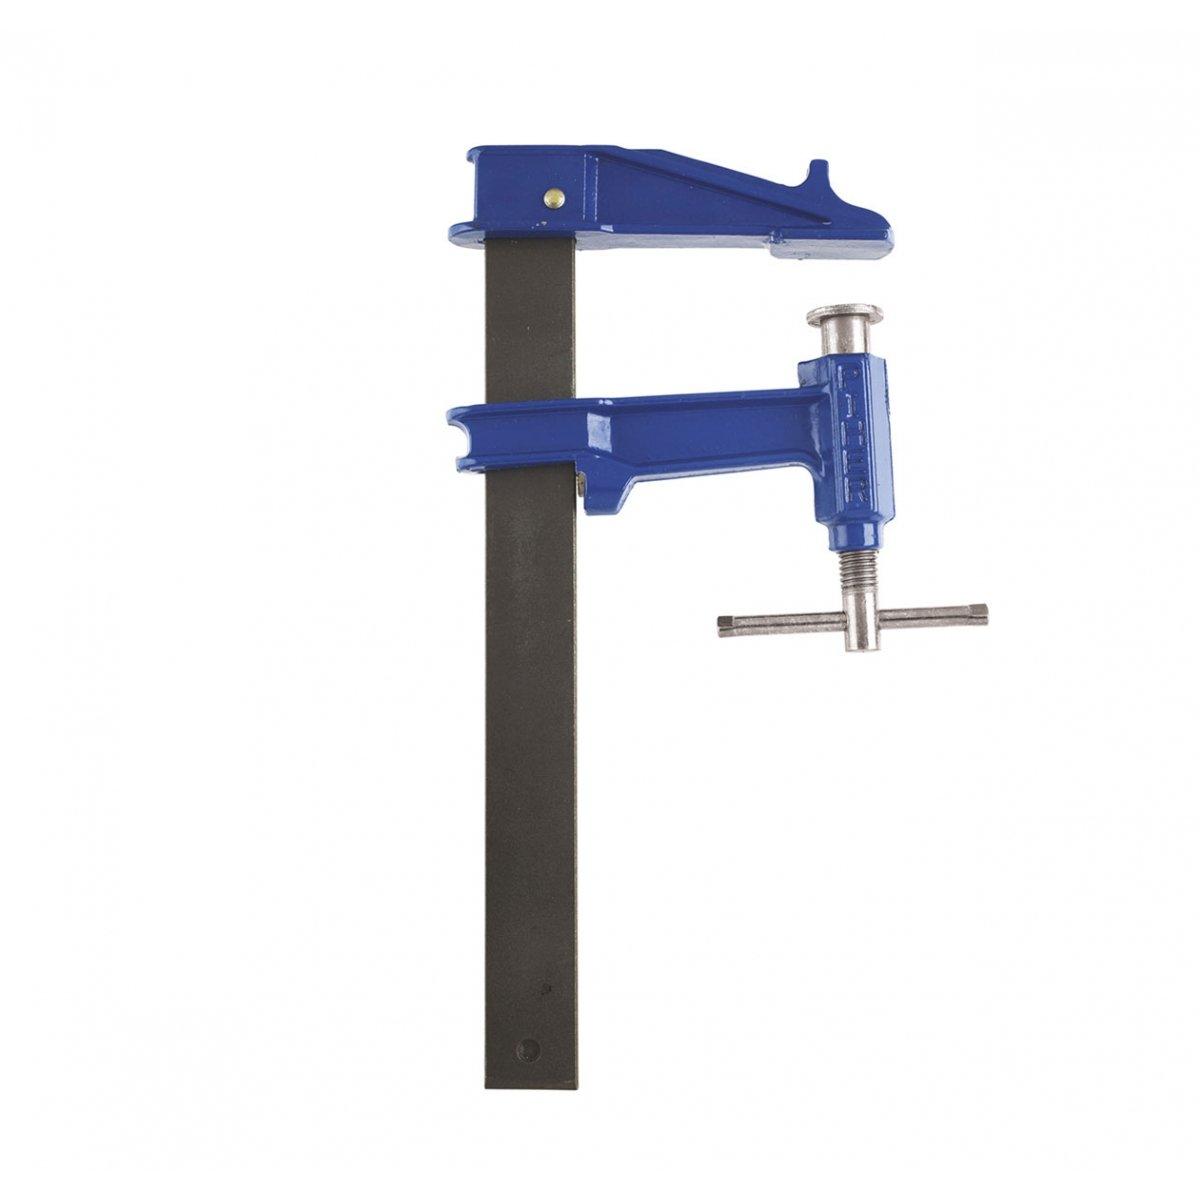 Piher M53838 - Tornillo de apriete f- 50: Amazon.es: Bricolaje y herramientas